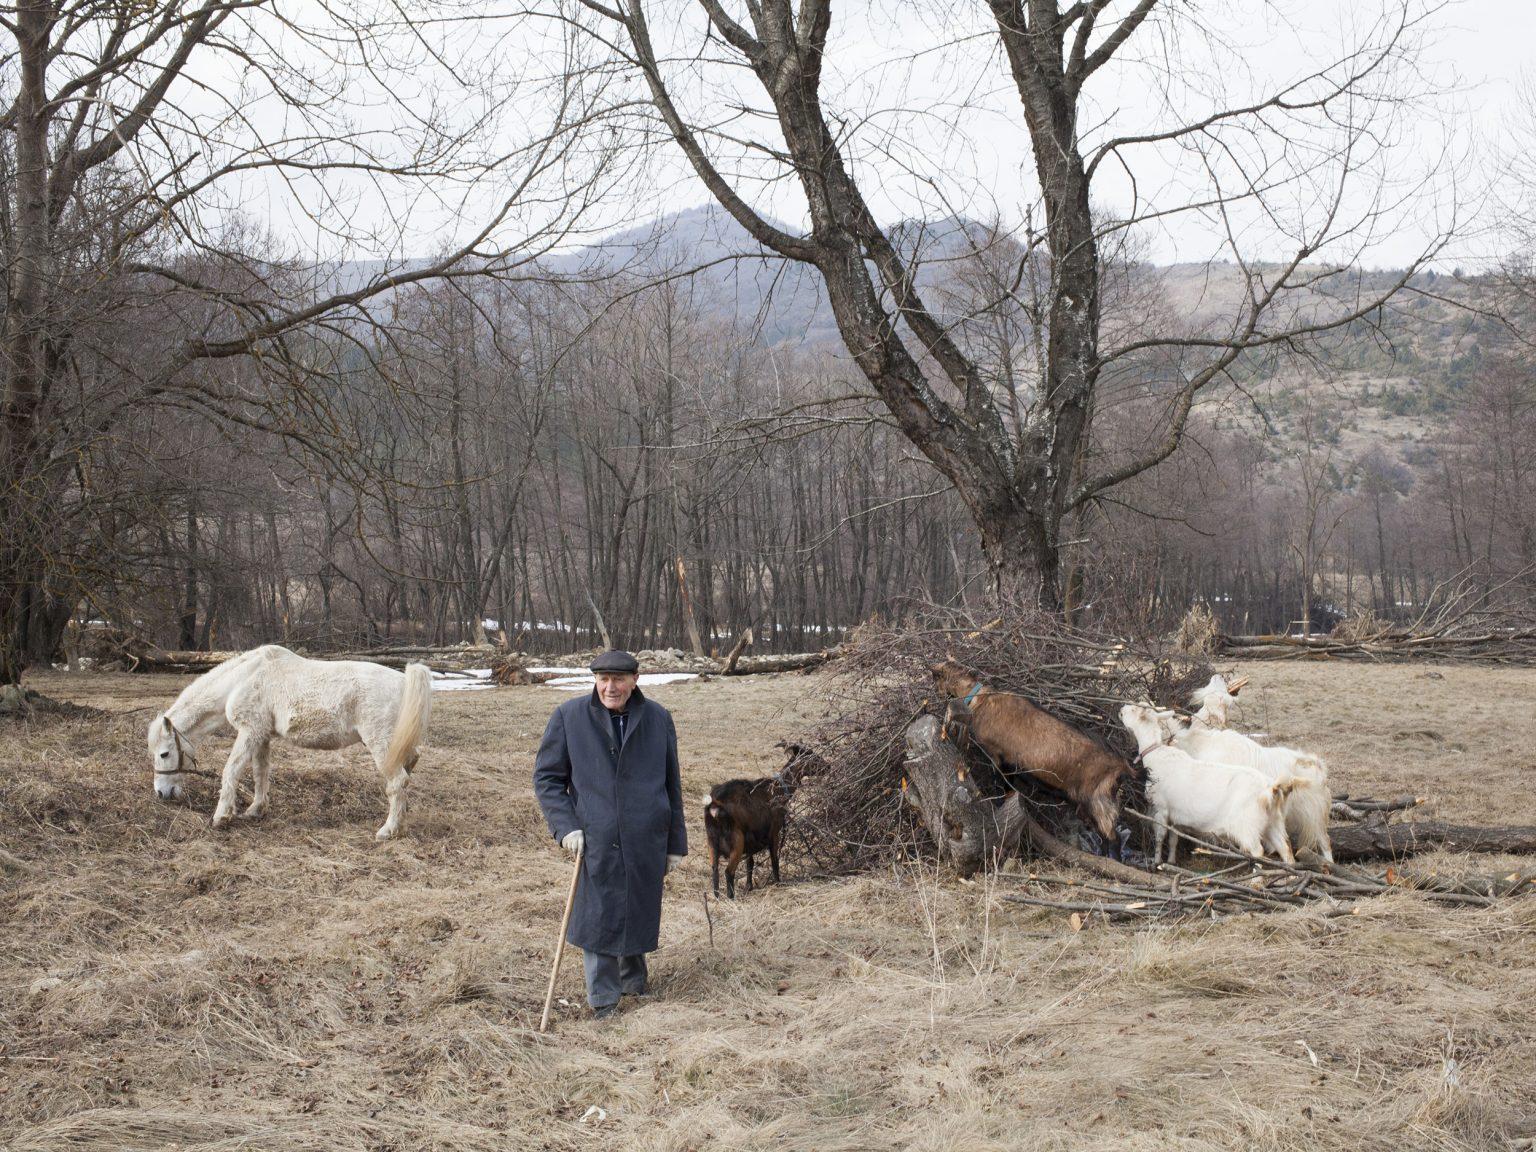 Milorad Boskocevic 89-year-old pastor in the Bosnian community in the municipality of Shtërpcë-Štrpce.